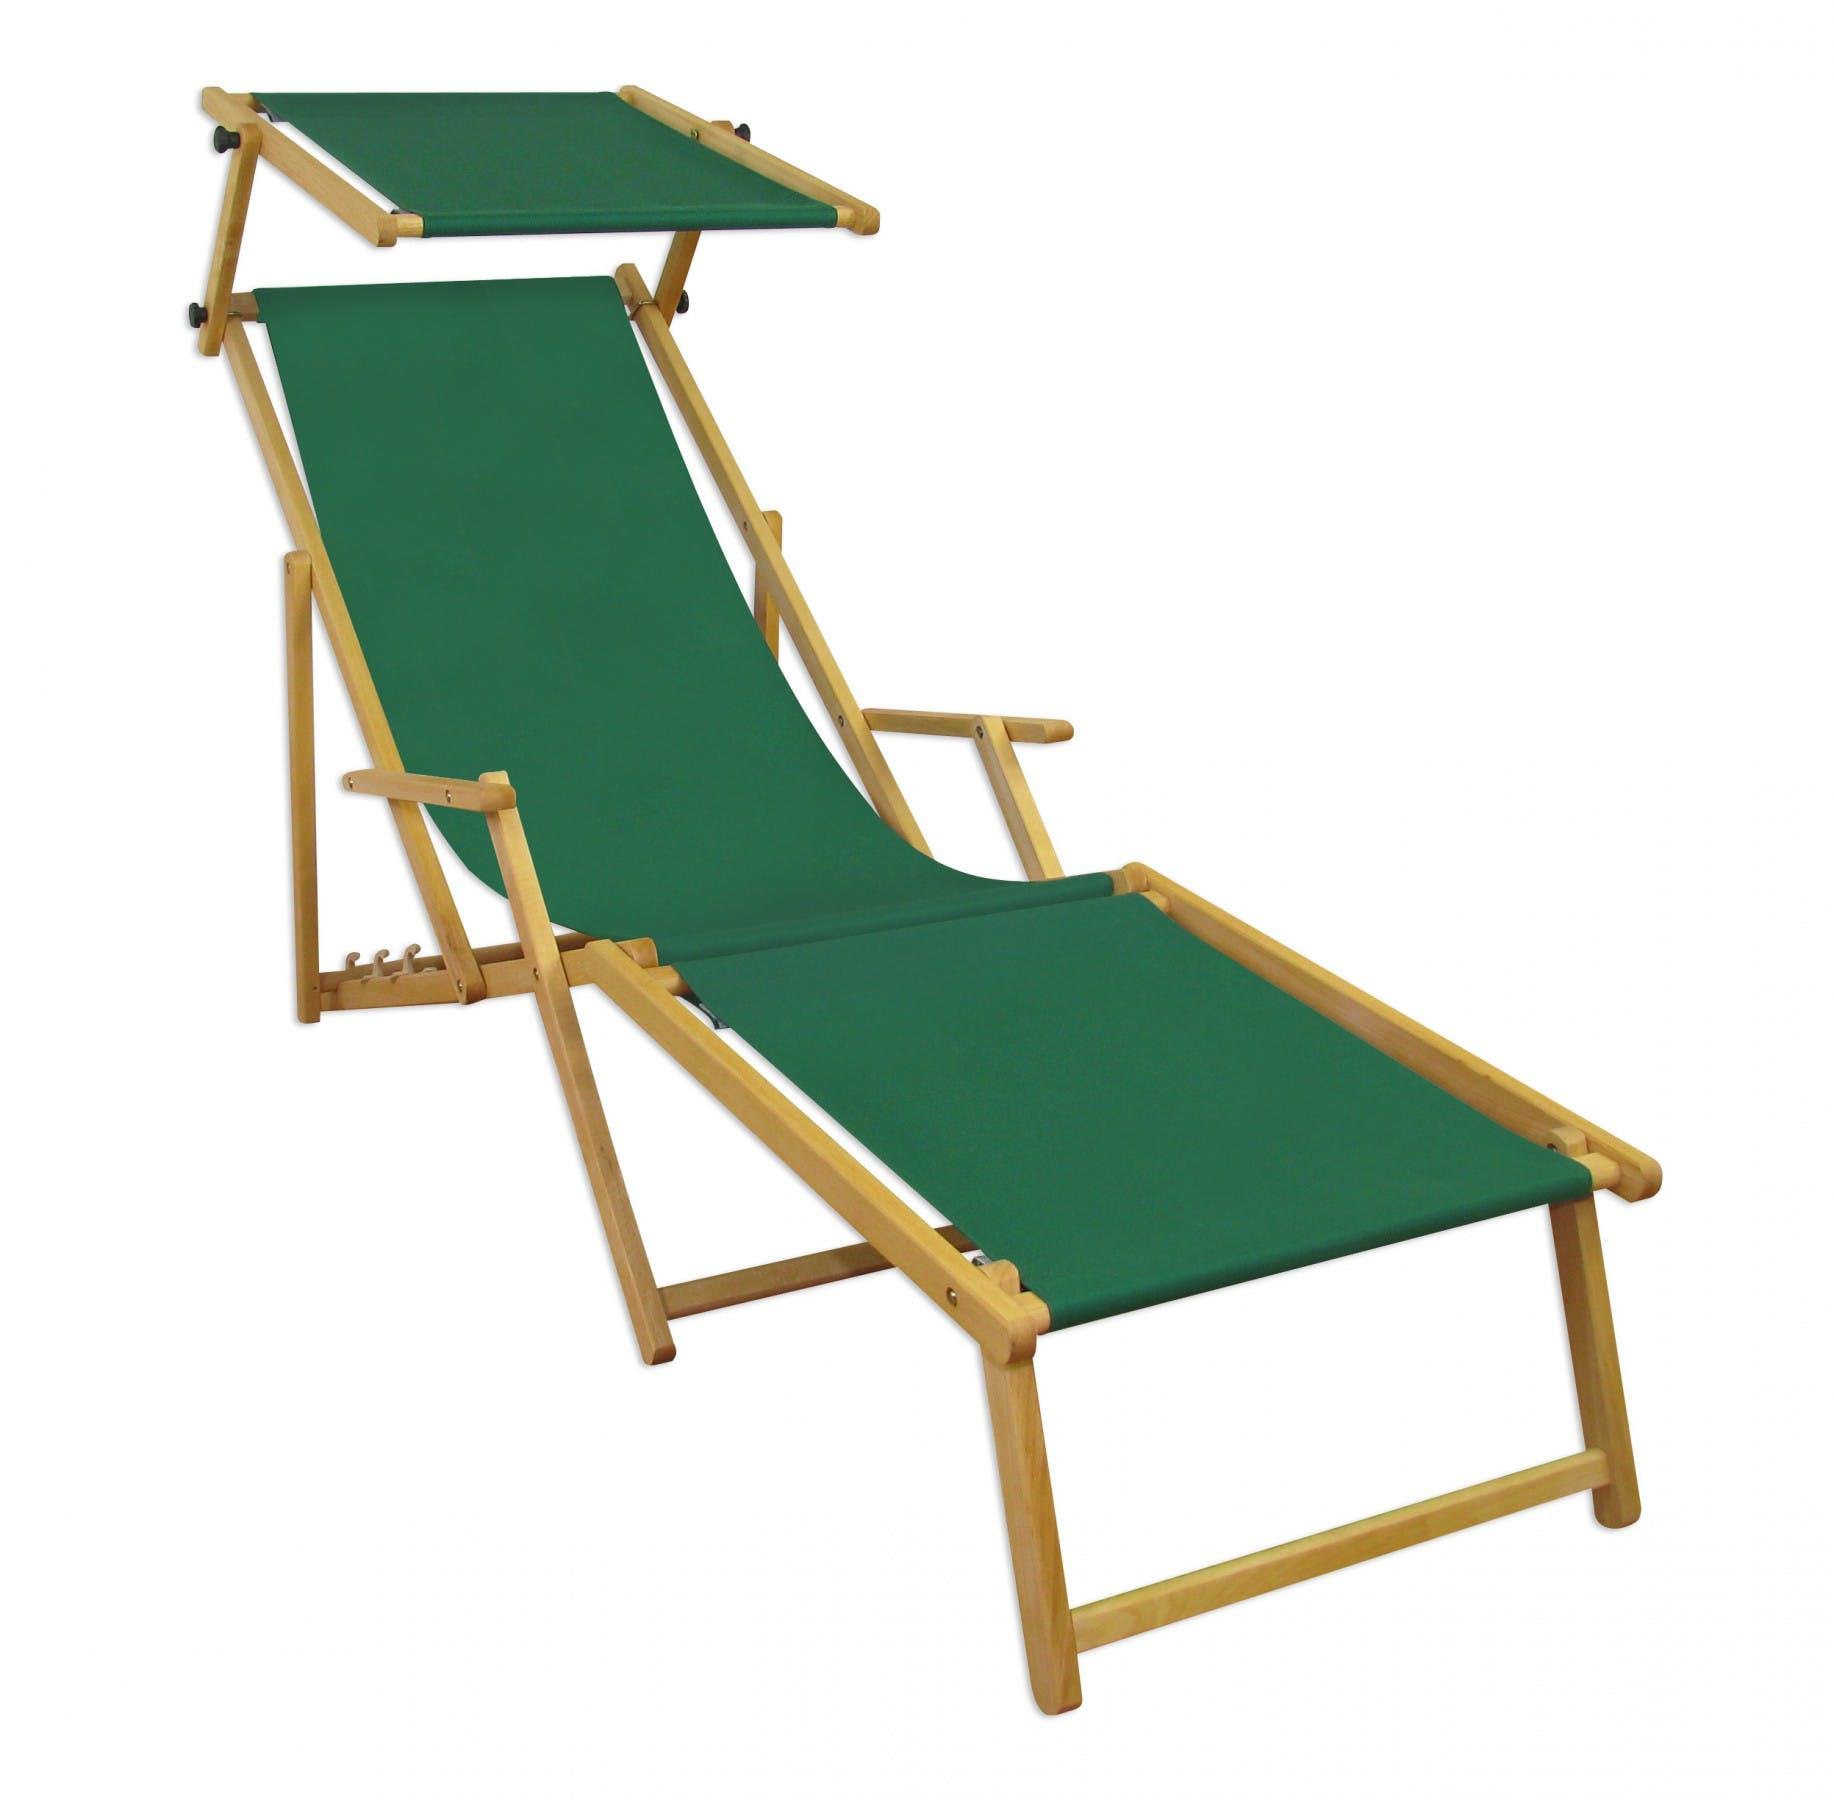 Gartenliege Sonnenliege Grun Liegestuhl Fussteil Sonnendach Deckchair Holz Gartenmobel 10 304nfs Metro Marktplatz